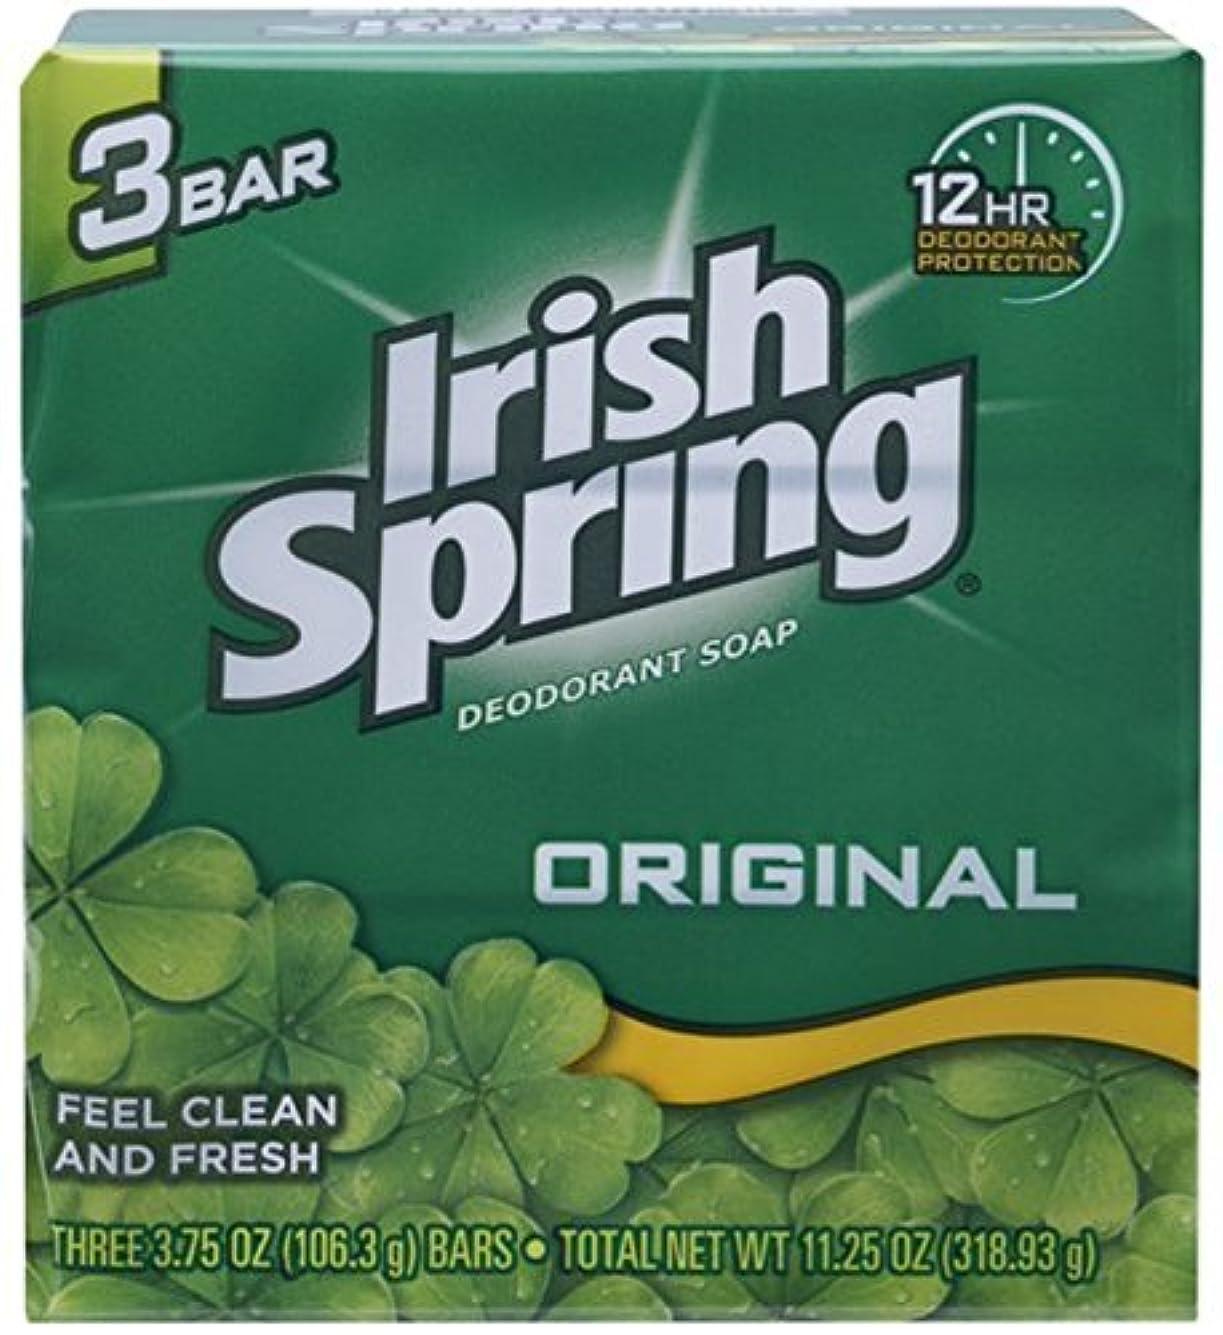 Irish Spring デオドラント石鹸、オリジナル、3.75オズバー、3 Eaは(12パック)